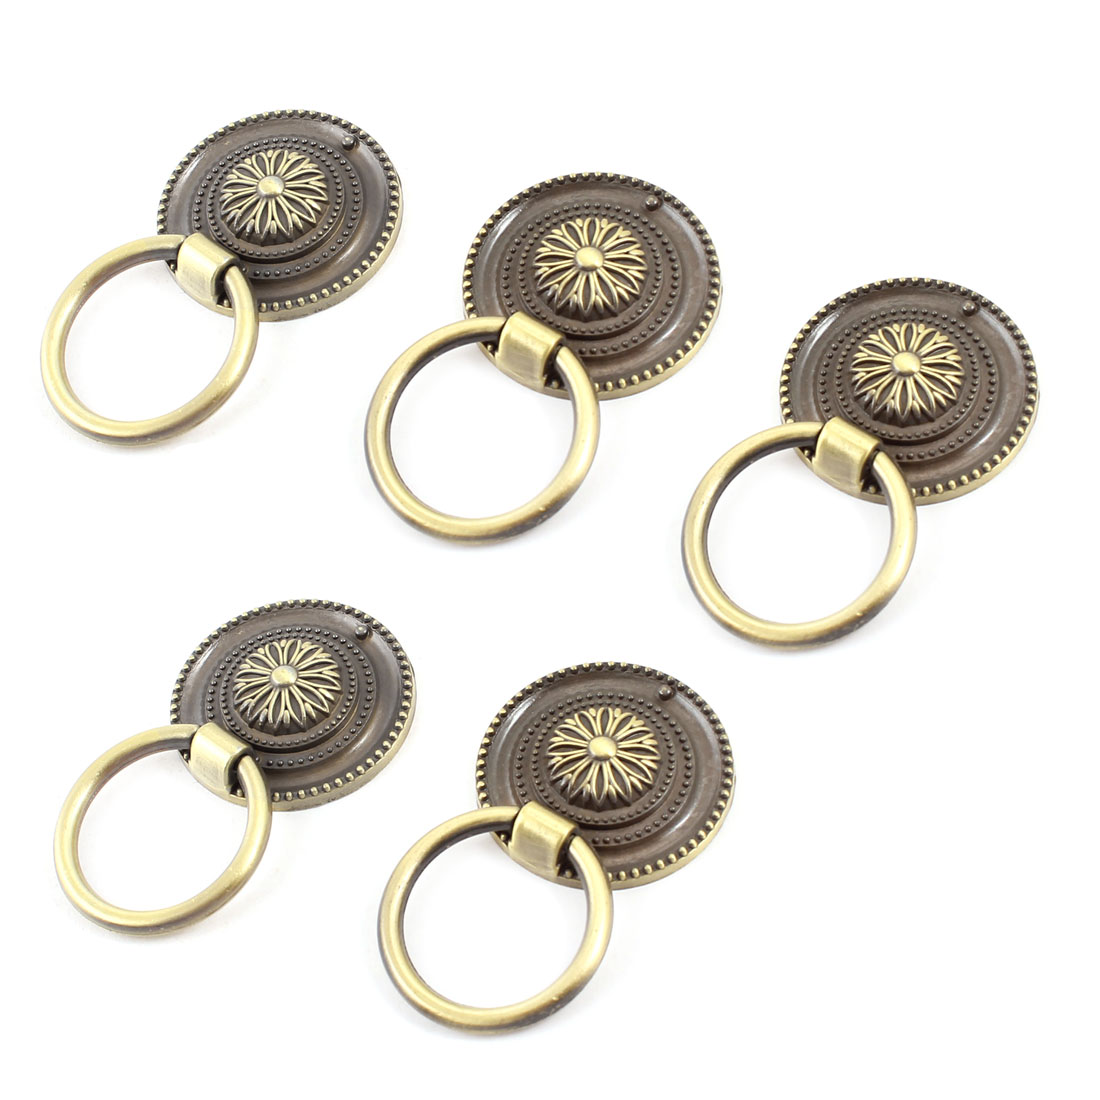 "5PCS Bronze Tone Flower Pattern Metal Ring Furniture Door Pull Handle Grip 1.7"" Dia"